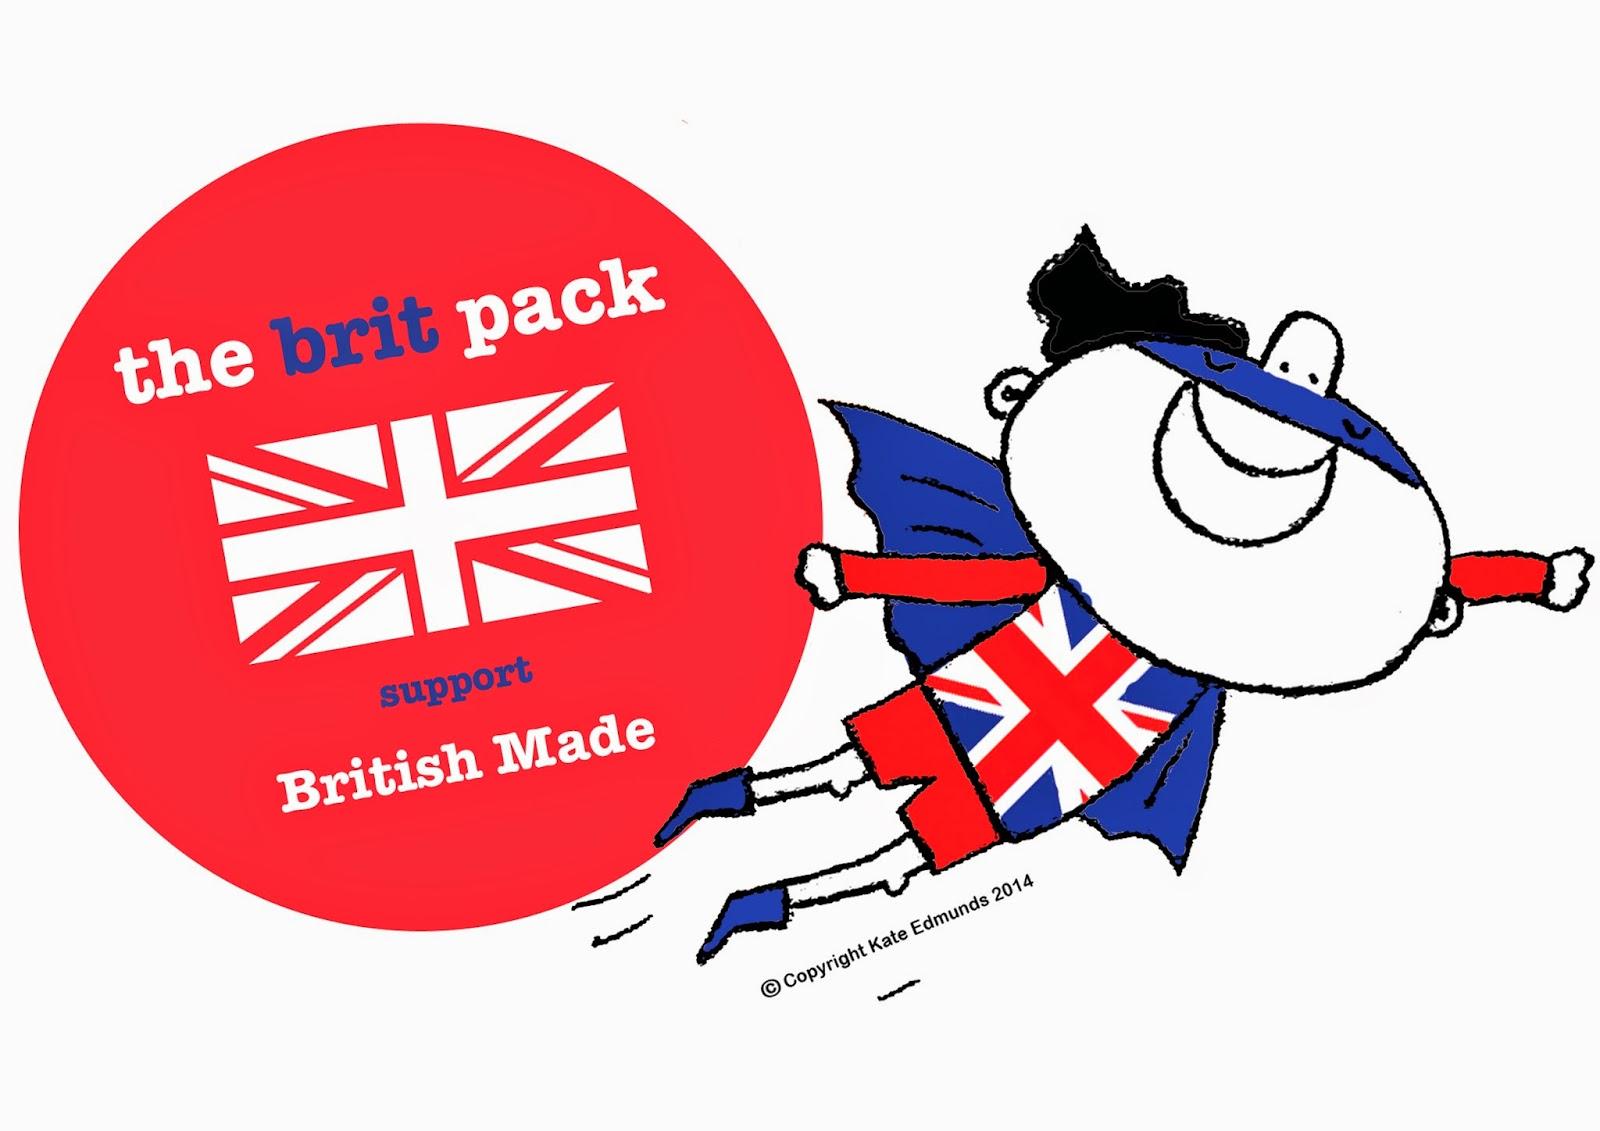 British made clothing